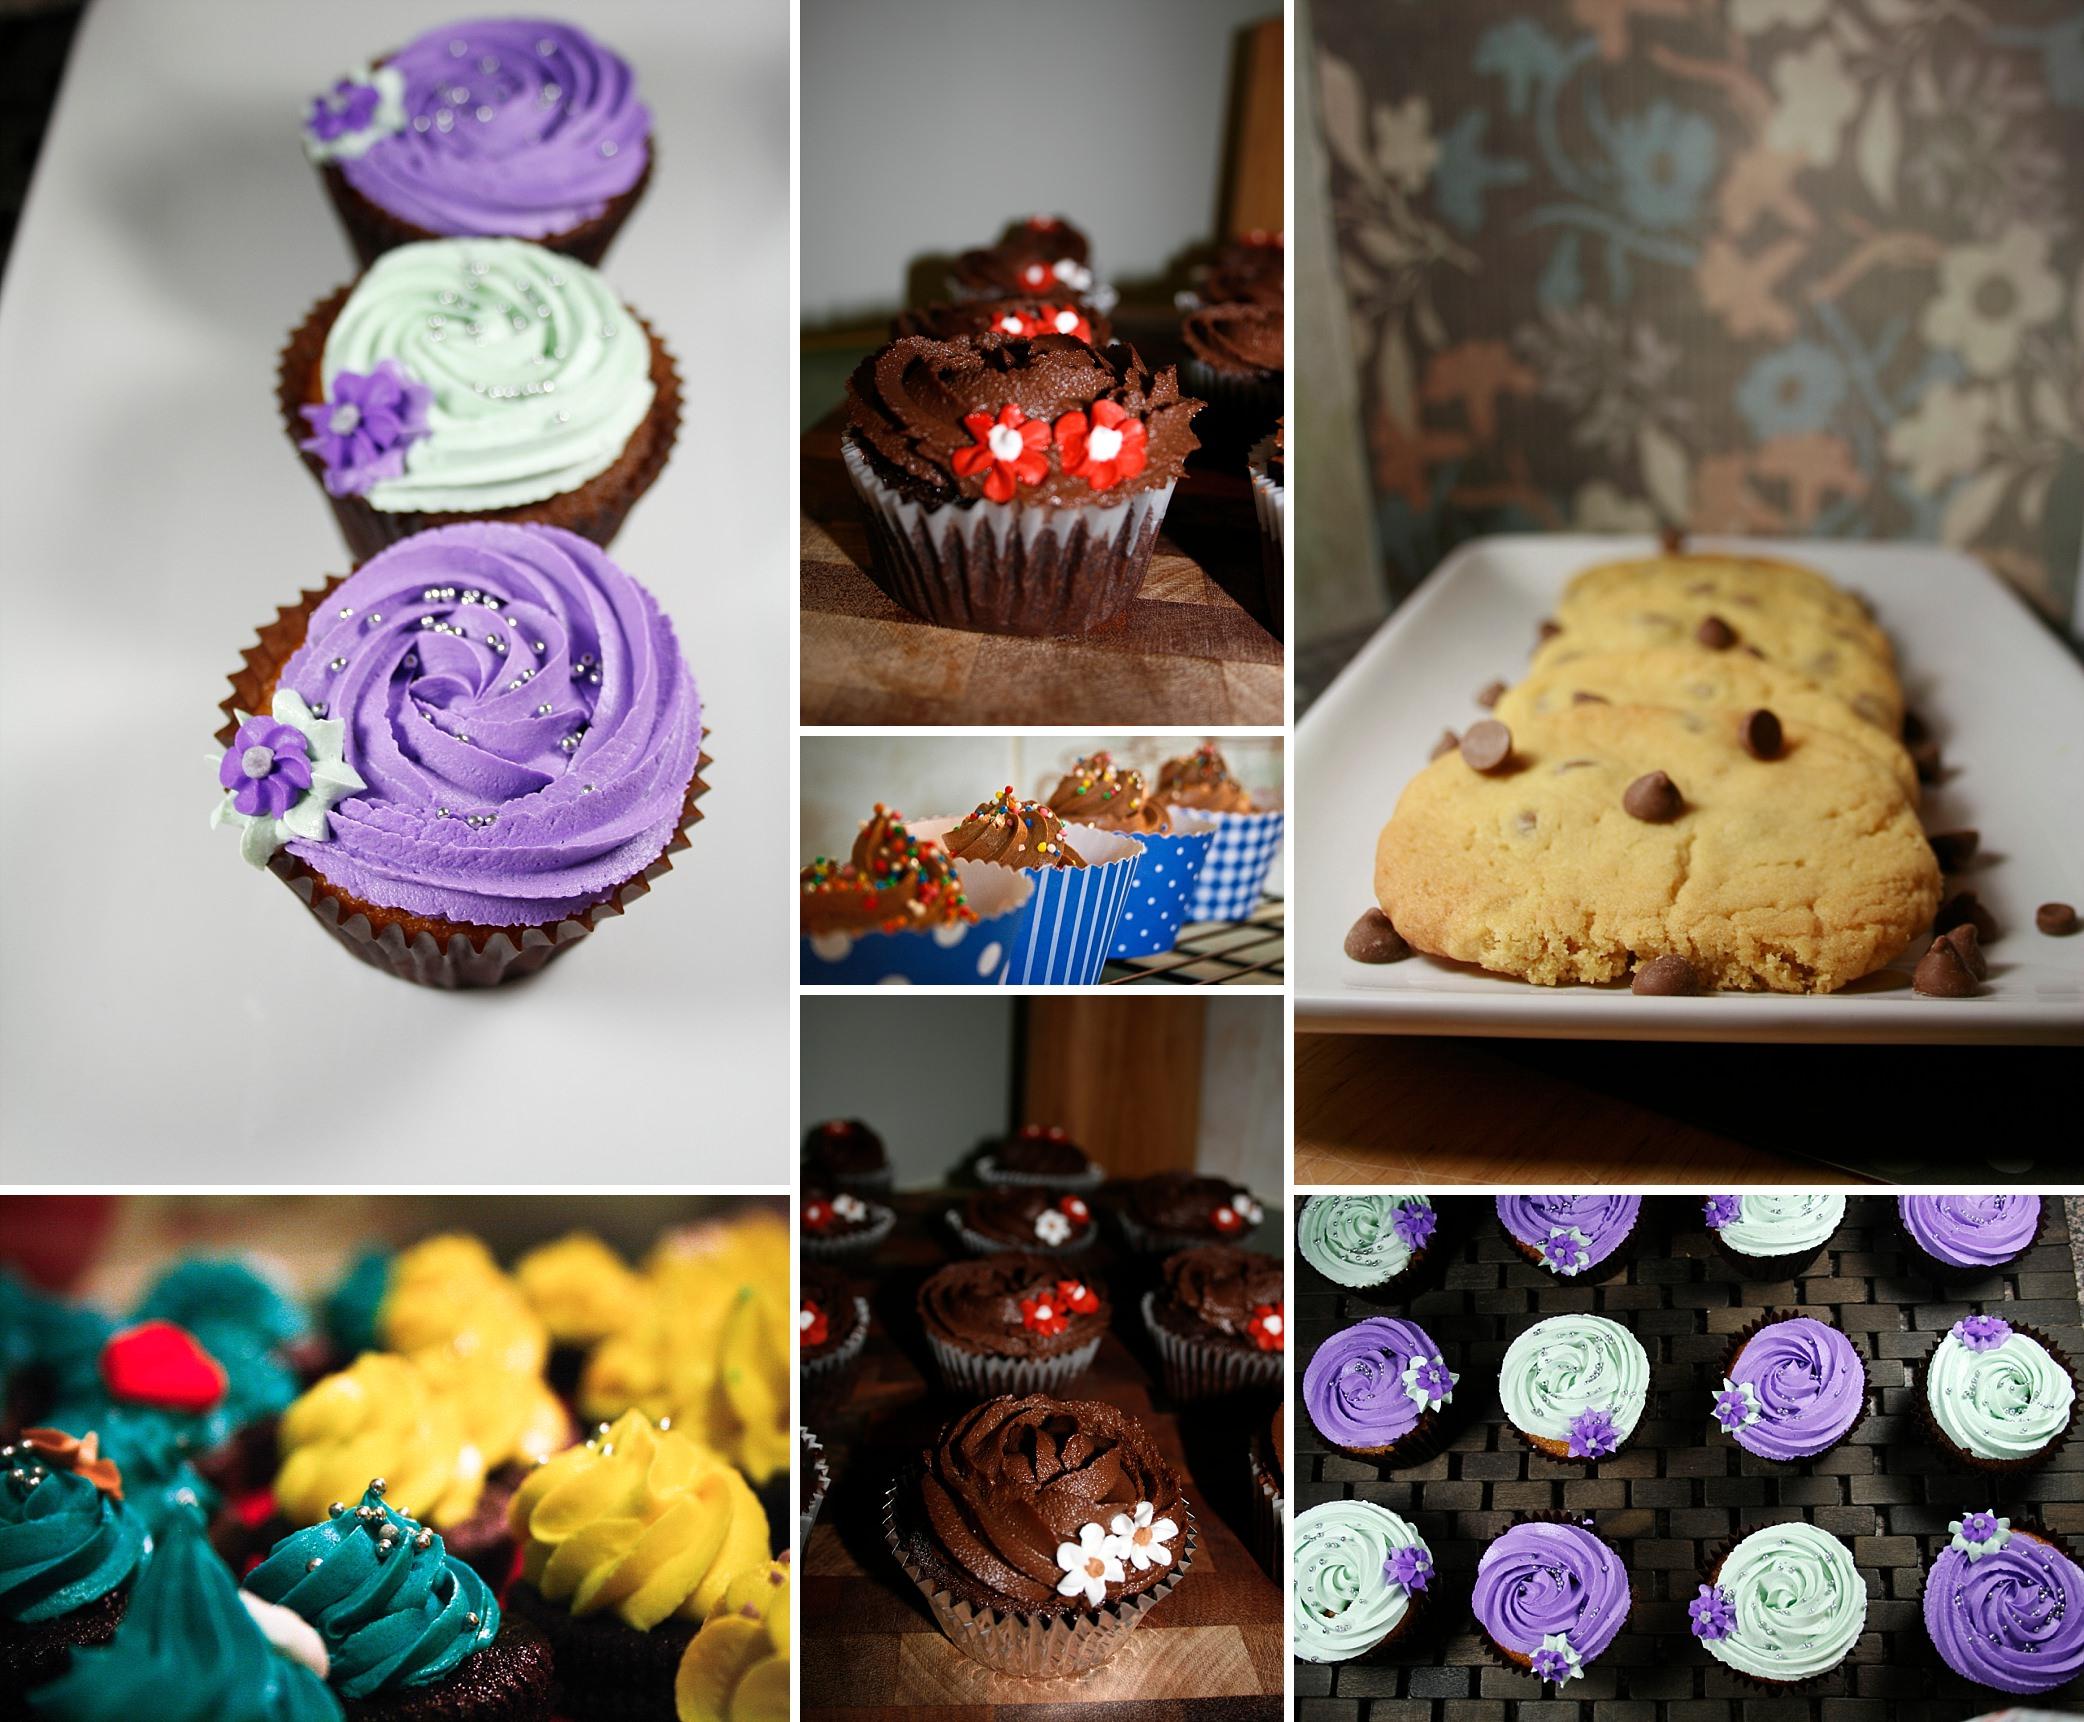 Really bad photo of cupcakes